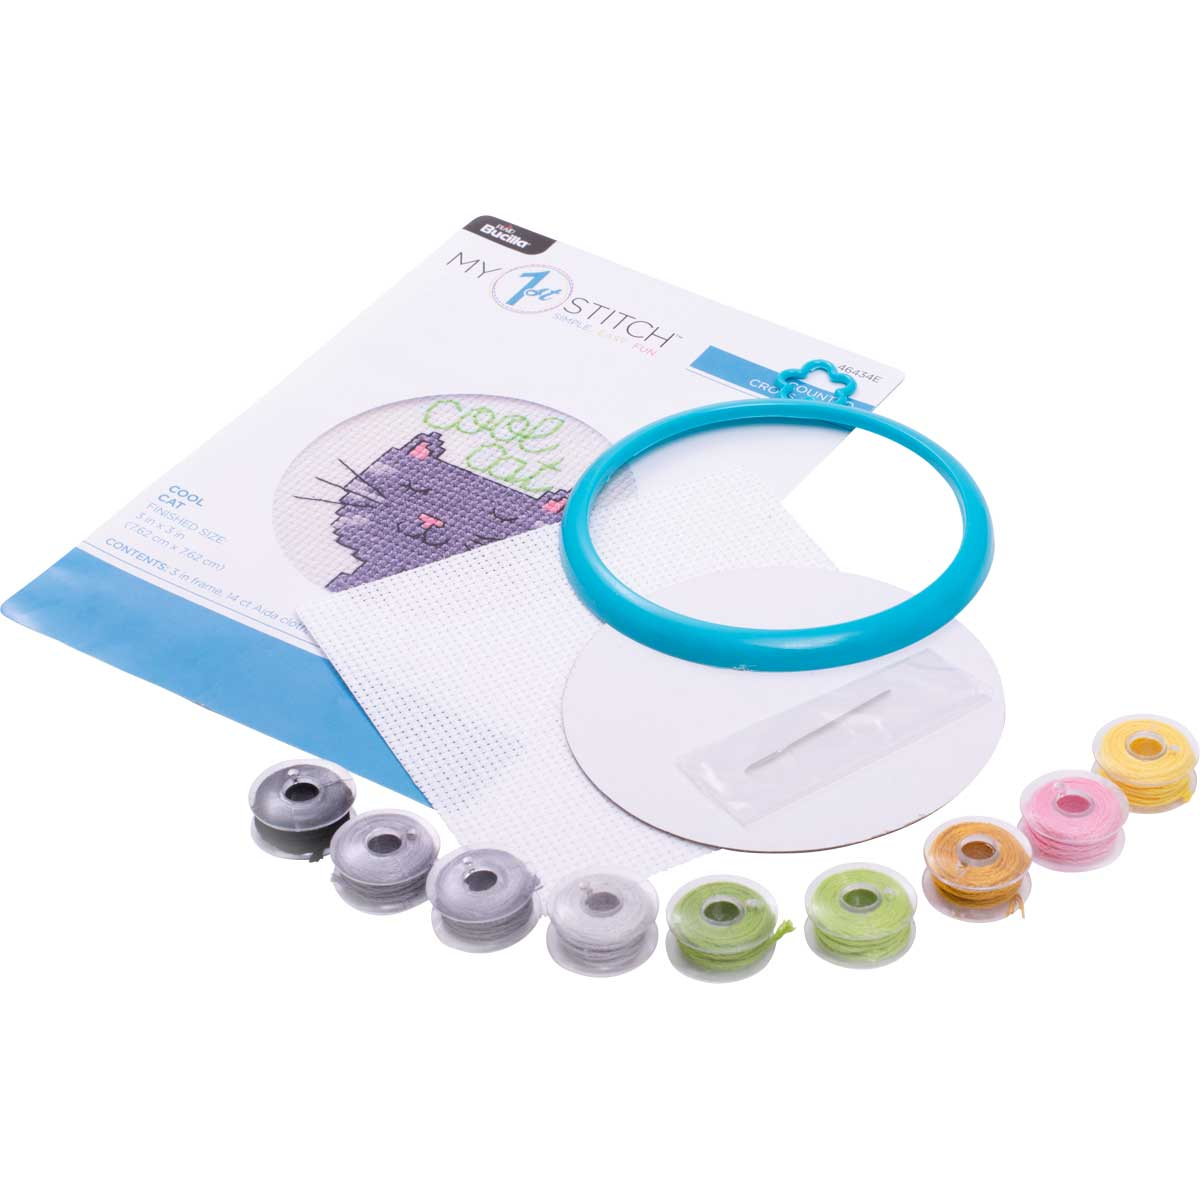 Bucilla ® My 1st Stitch™ - Counted Cross Stitch Kits - Mini - Cool Cat